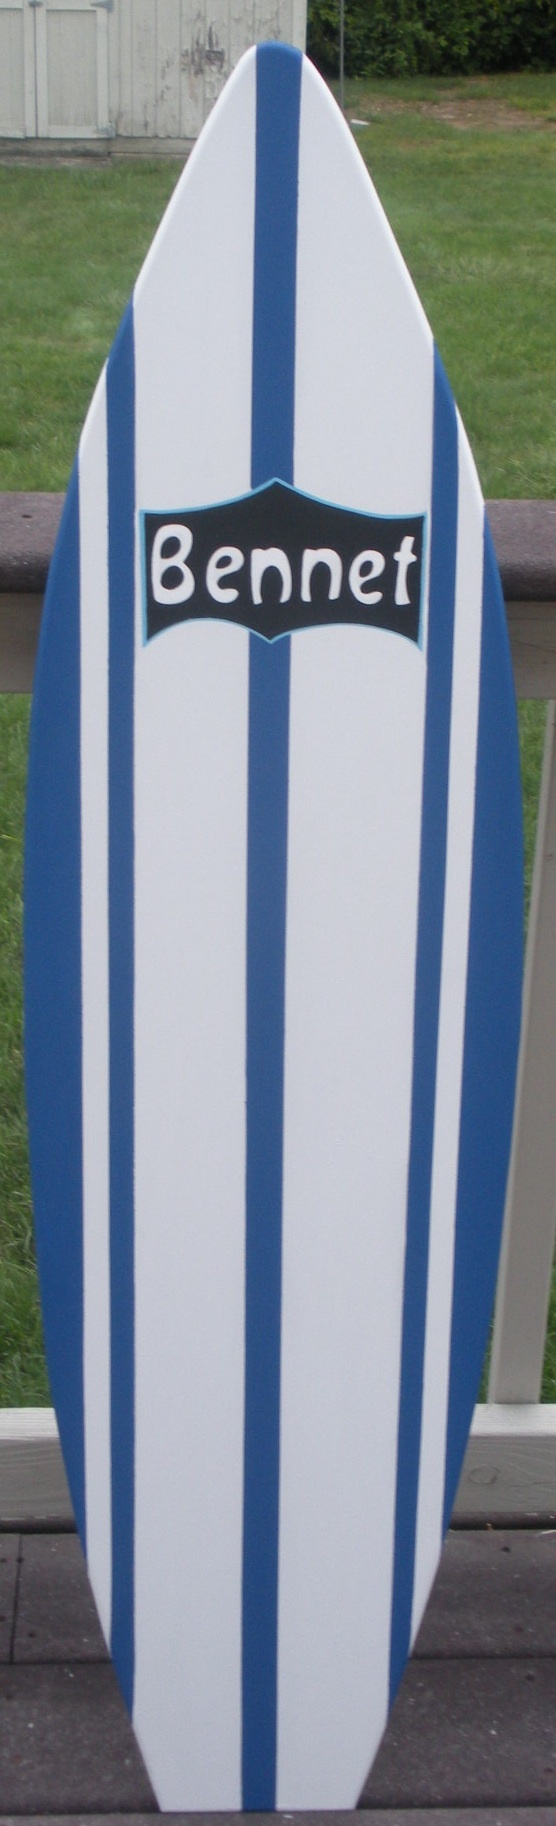 69 best surfboard decor images on pinterest alternative to httpsurfboardbeachart hand painted personalized surfboard wall dcor personalized amipublicfo Images